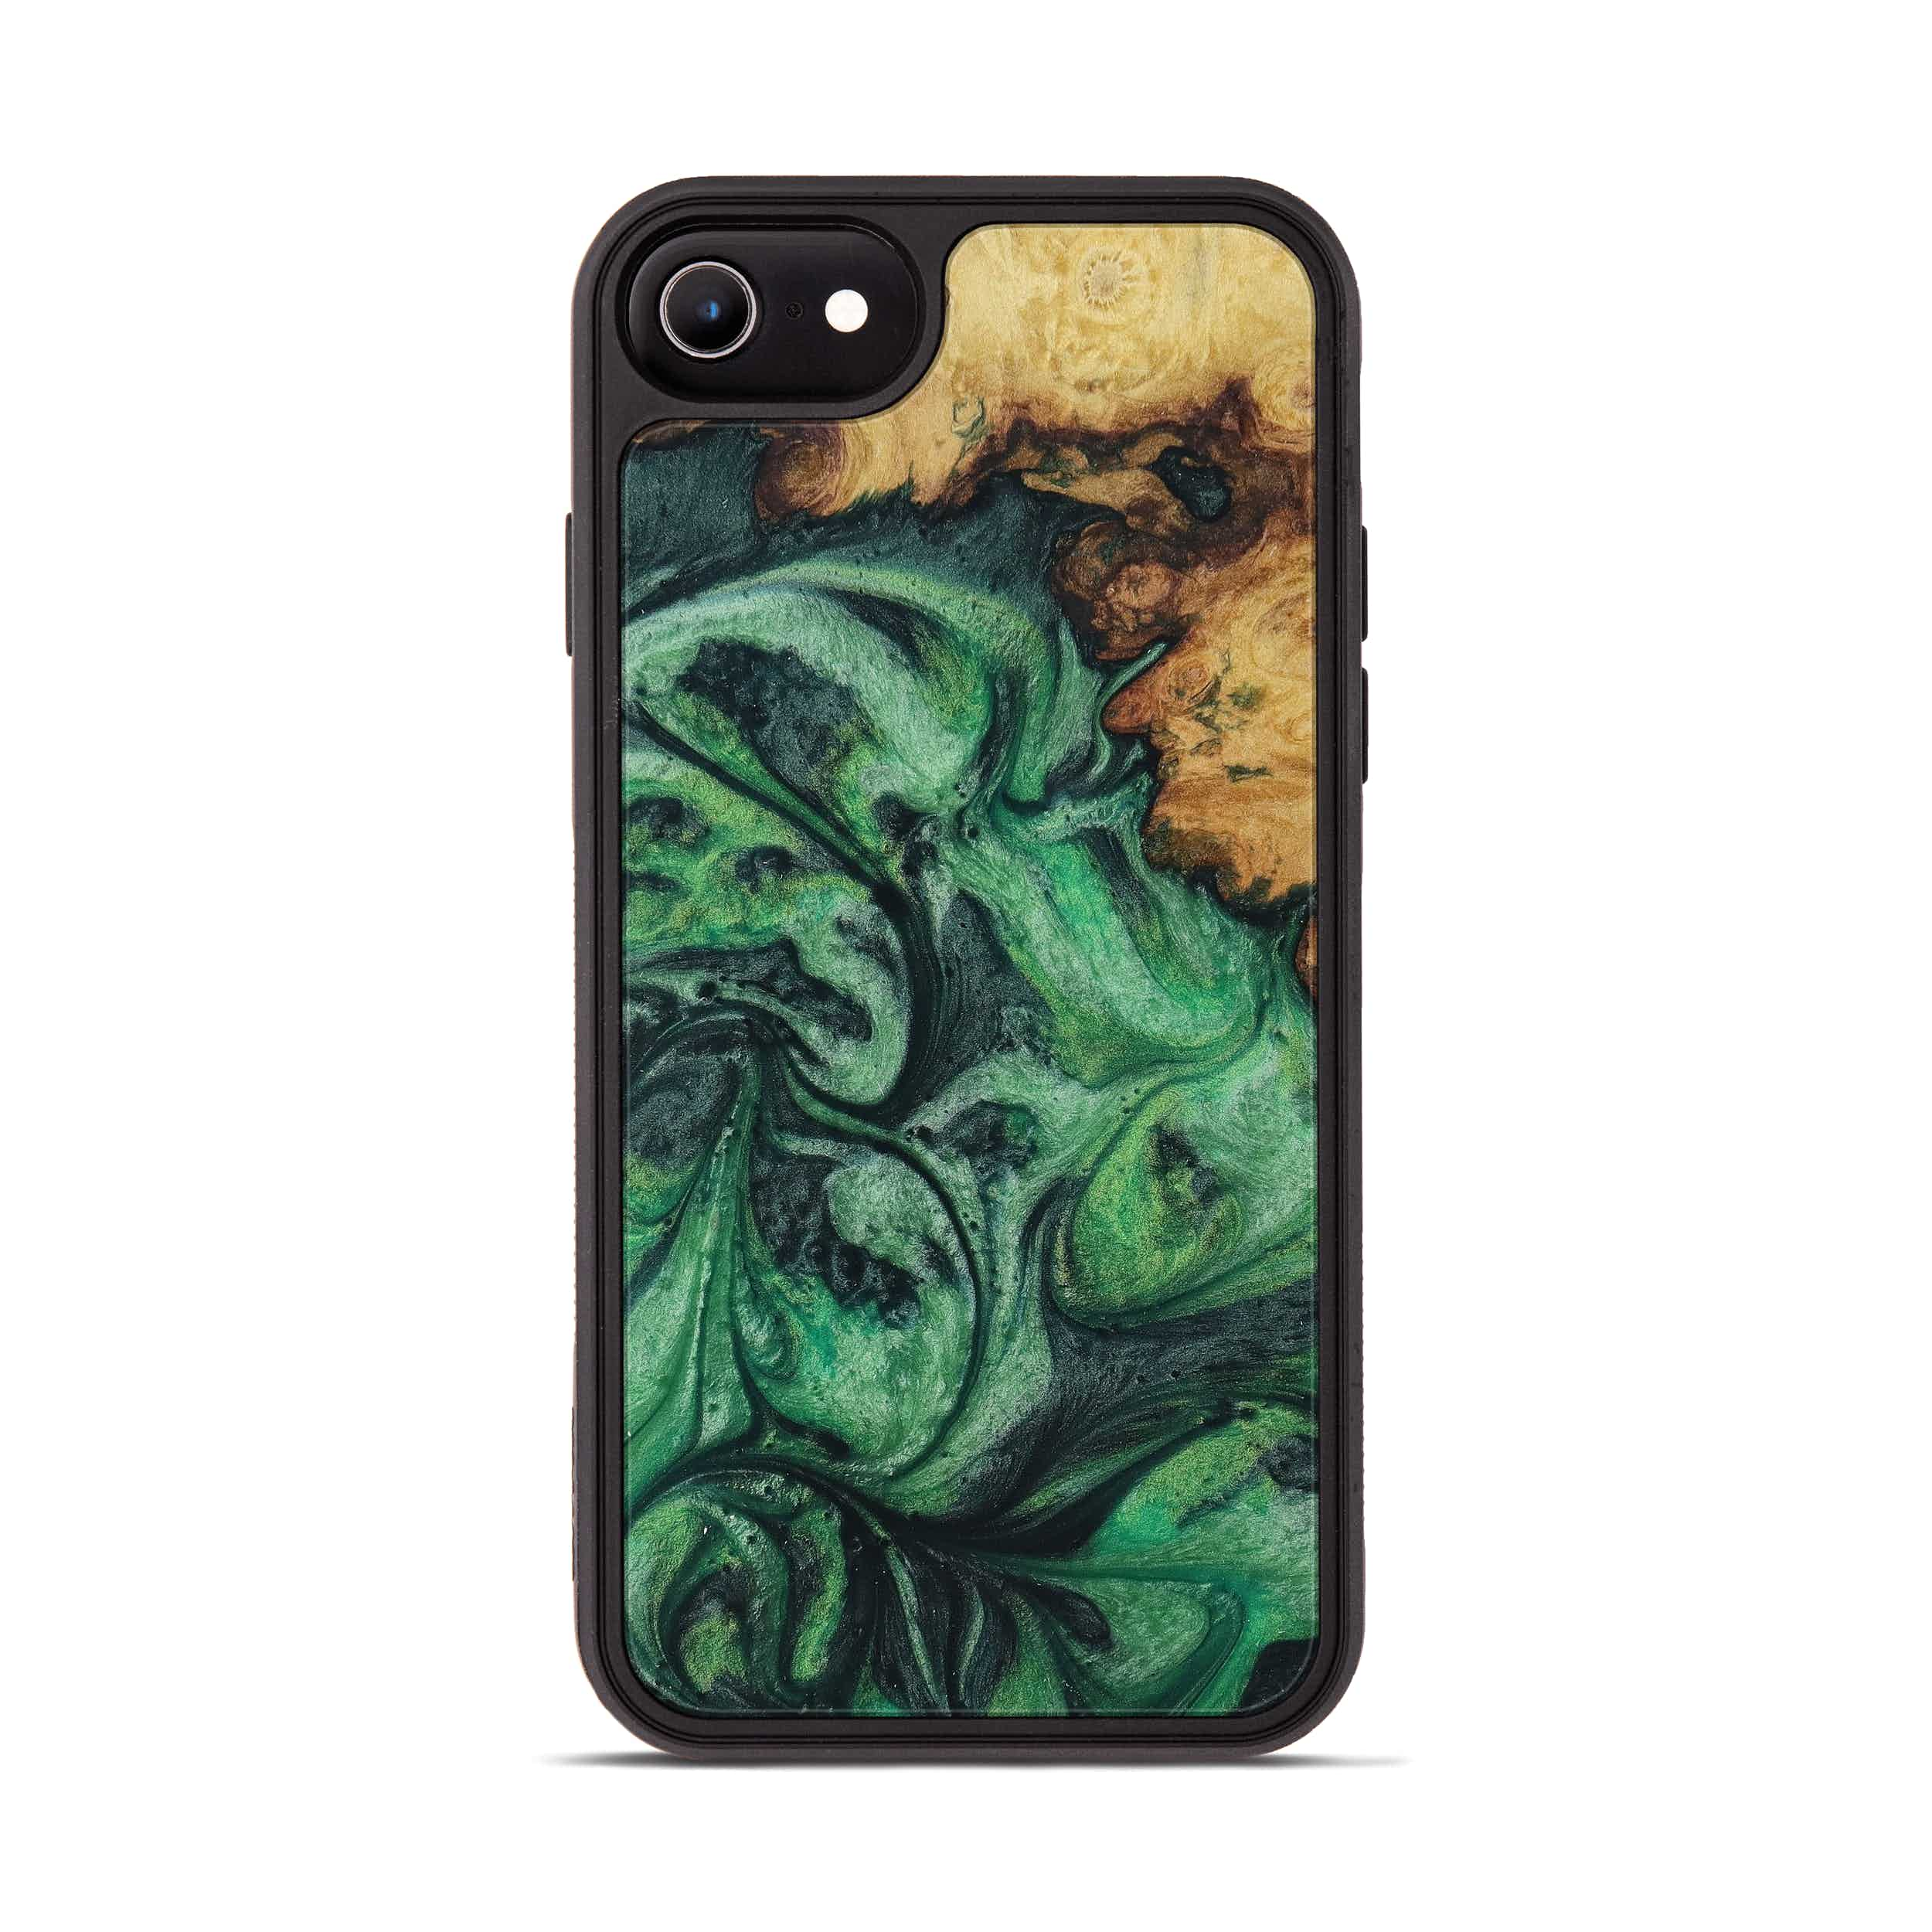 iPhone 6s Wood+Resin Phone Case - Yoke (Dark Green, 394695)